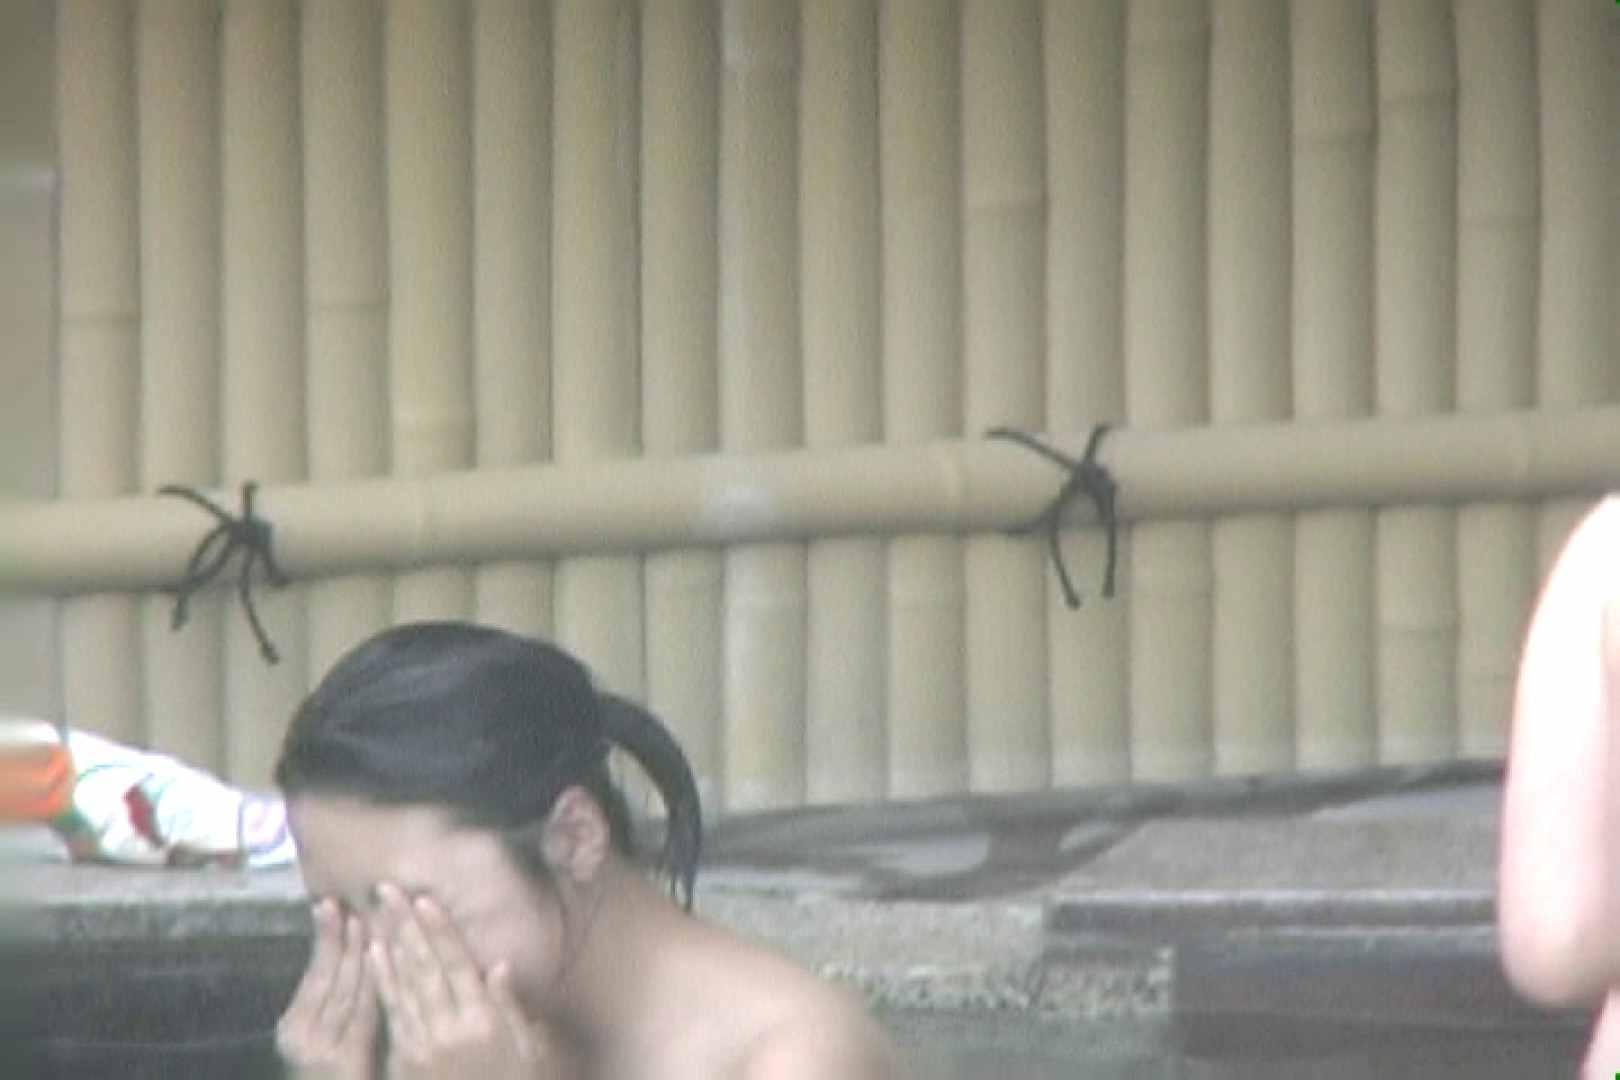 Aquaな露天風呂Vol.691 美しいOLの裸体 性交動画流出 75pic 5